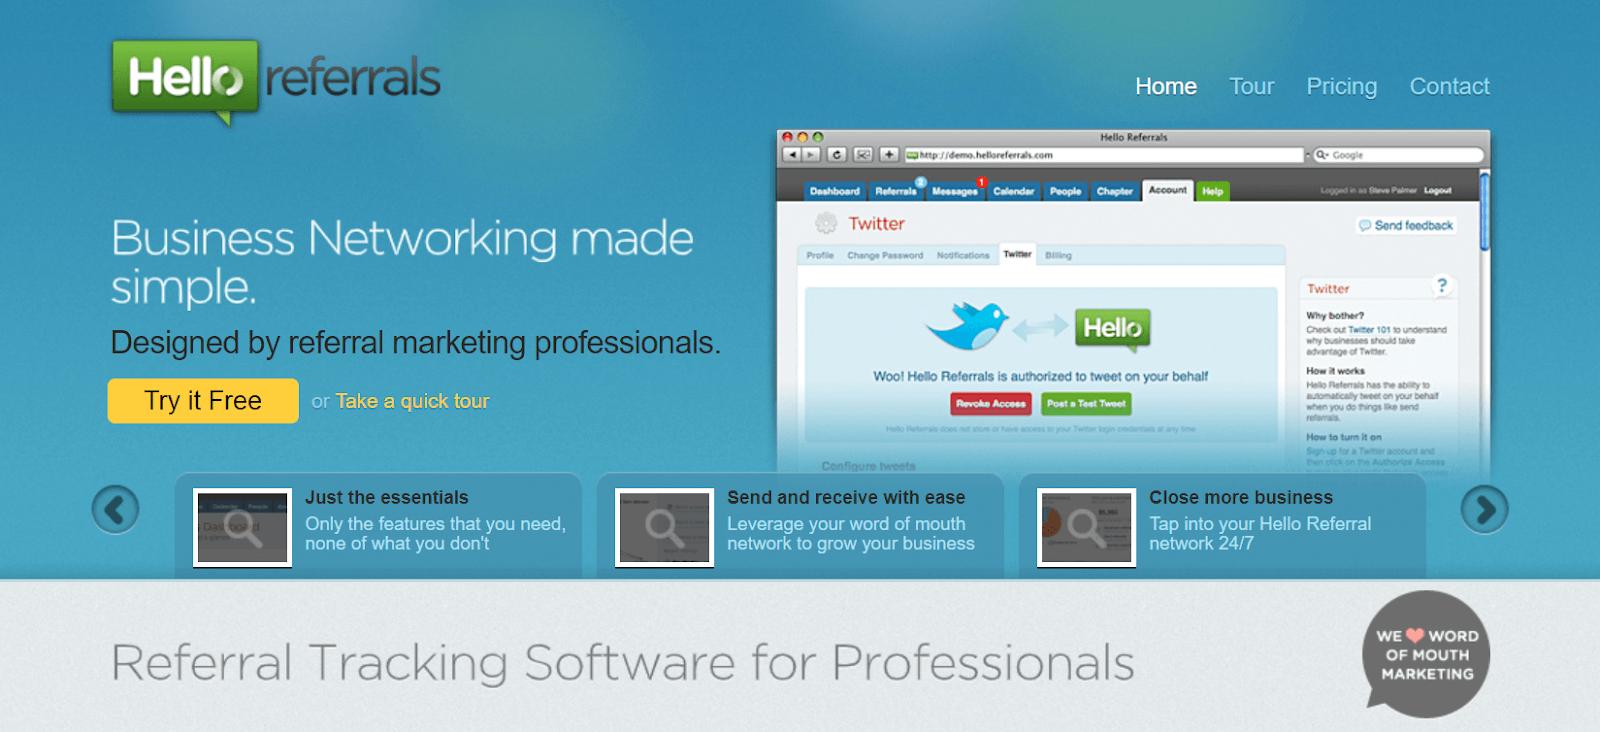 Hello Referrals Referral Marketing Software Tool